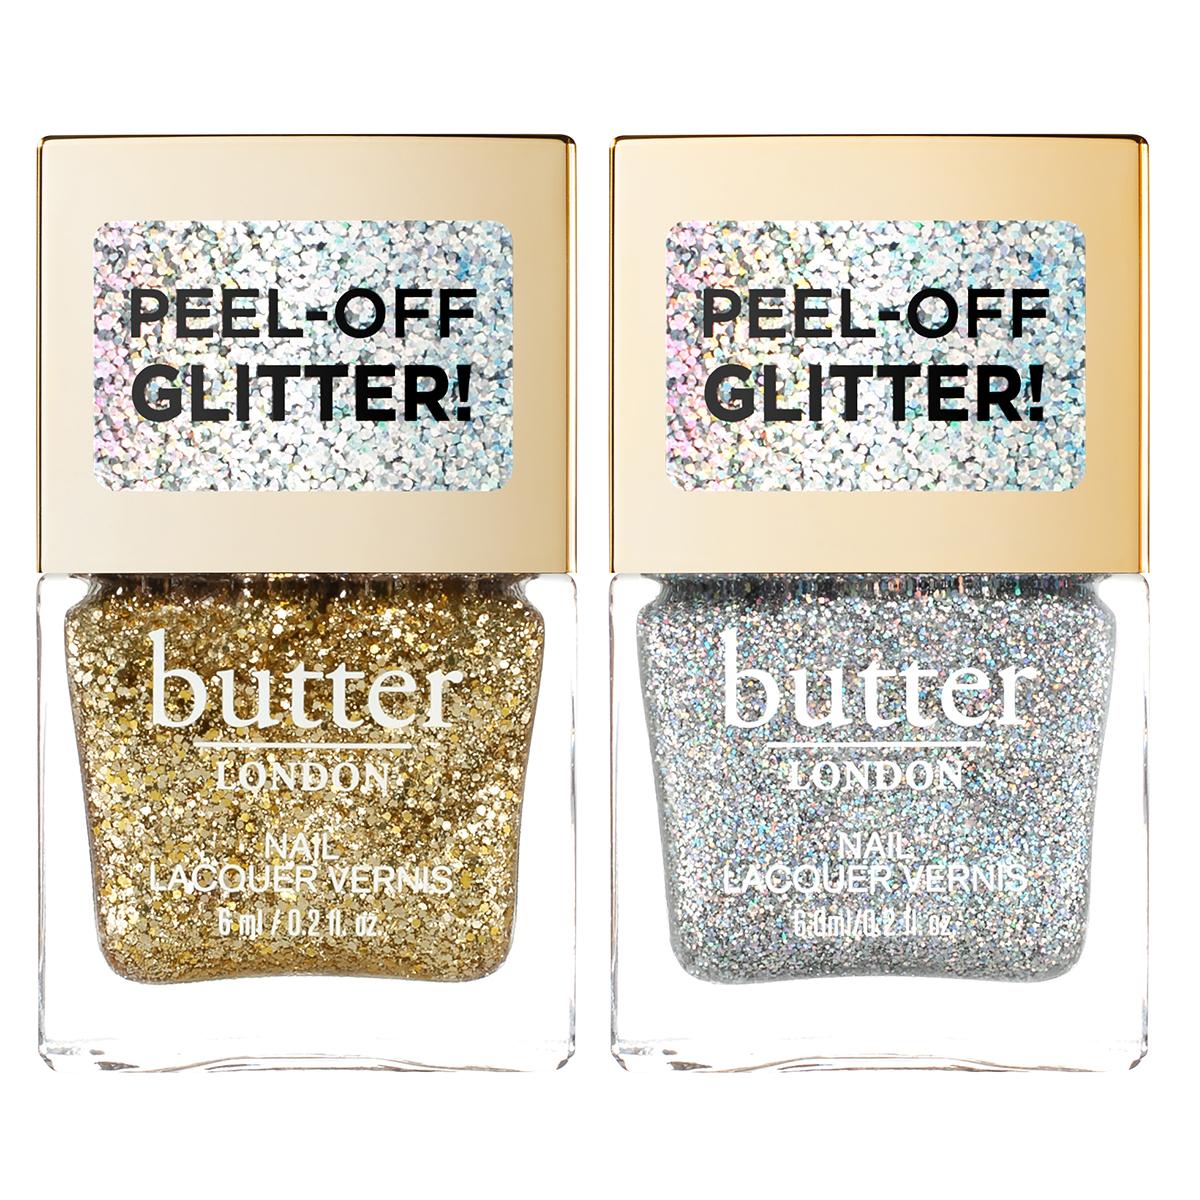 Two bottles of glitter nail polish